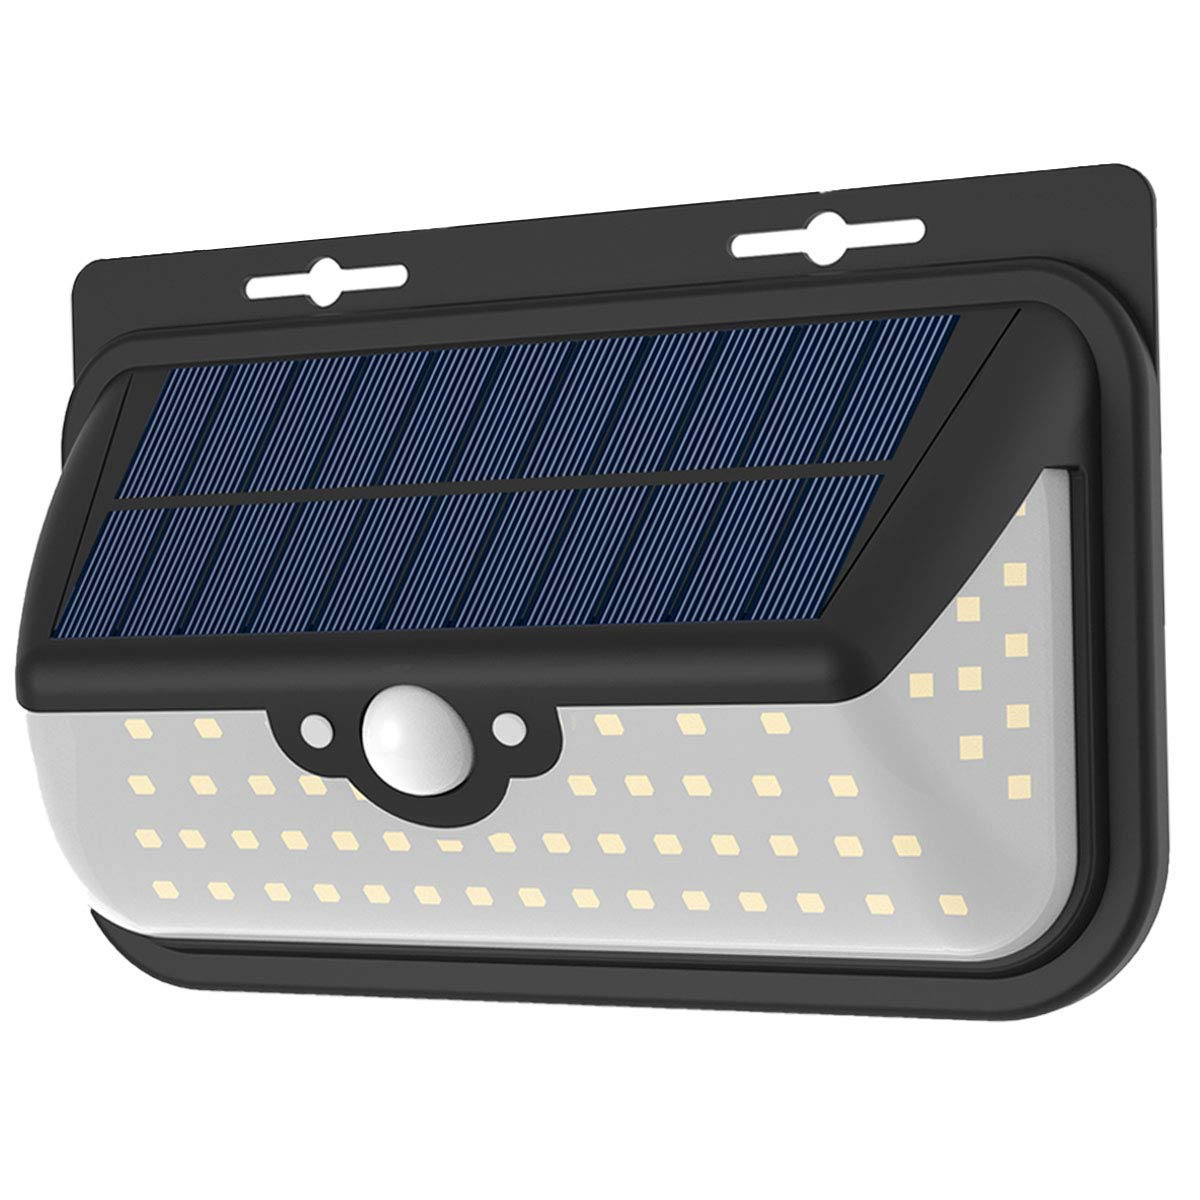 SBOW 68 LED Outdoor Solar Lights